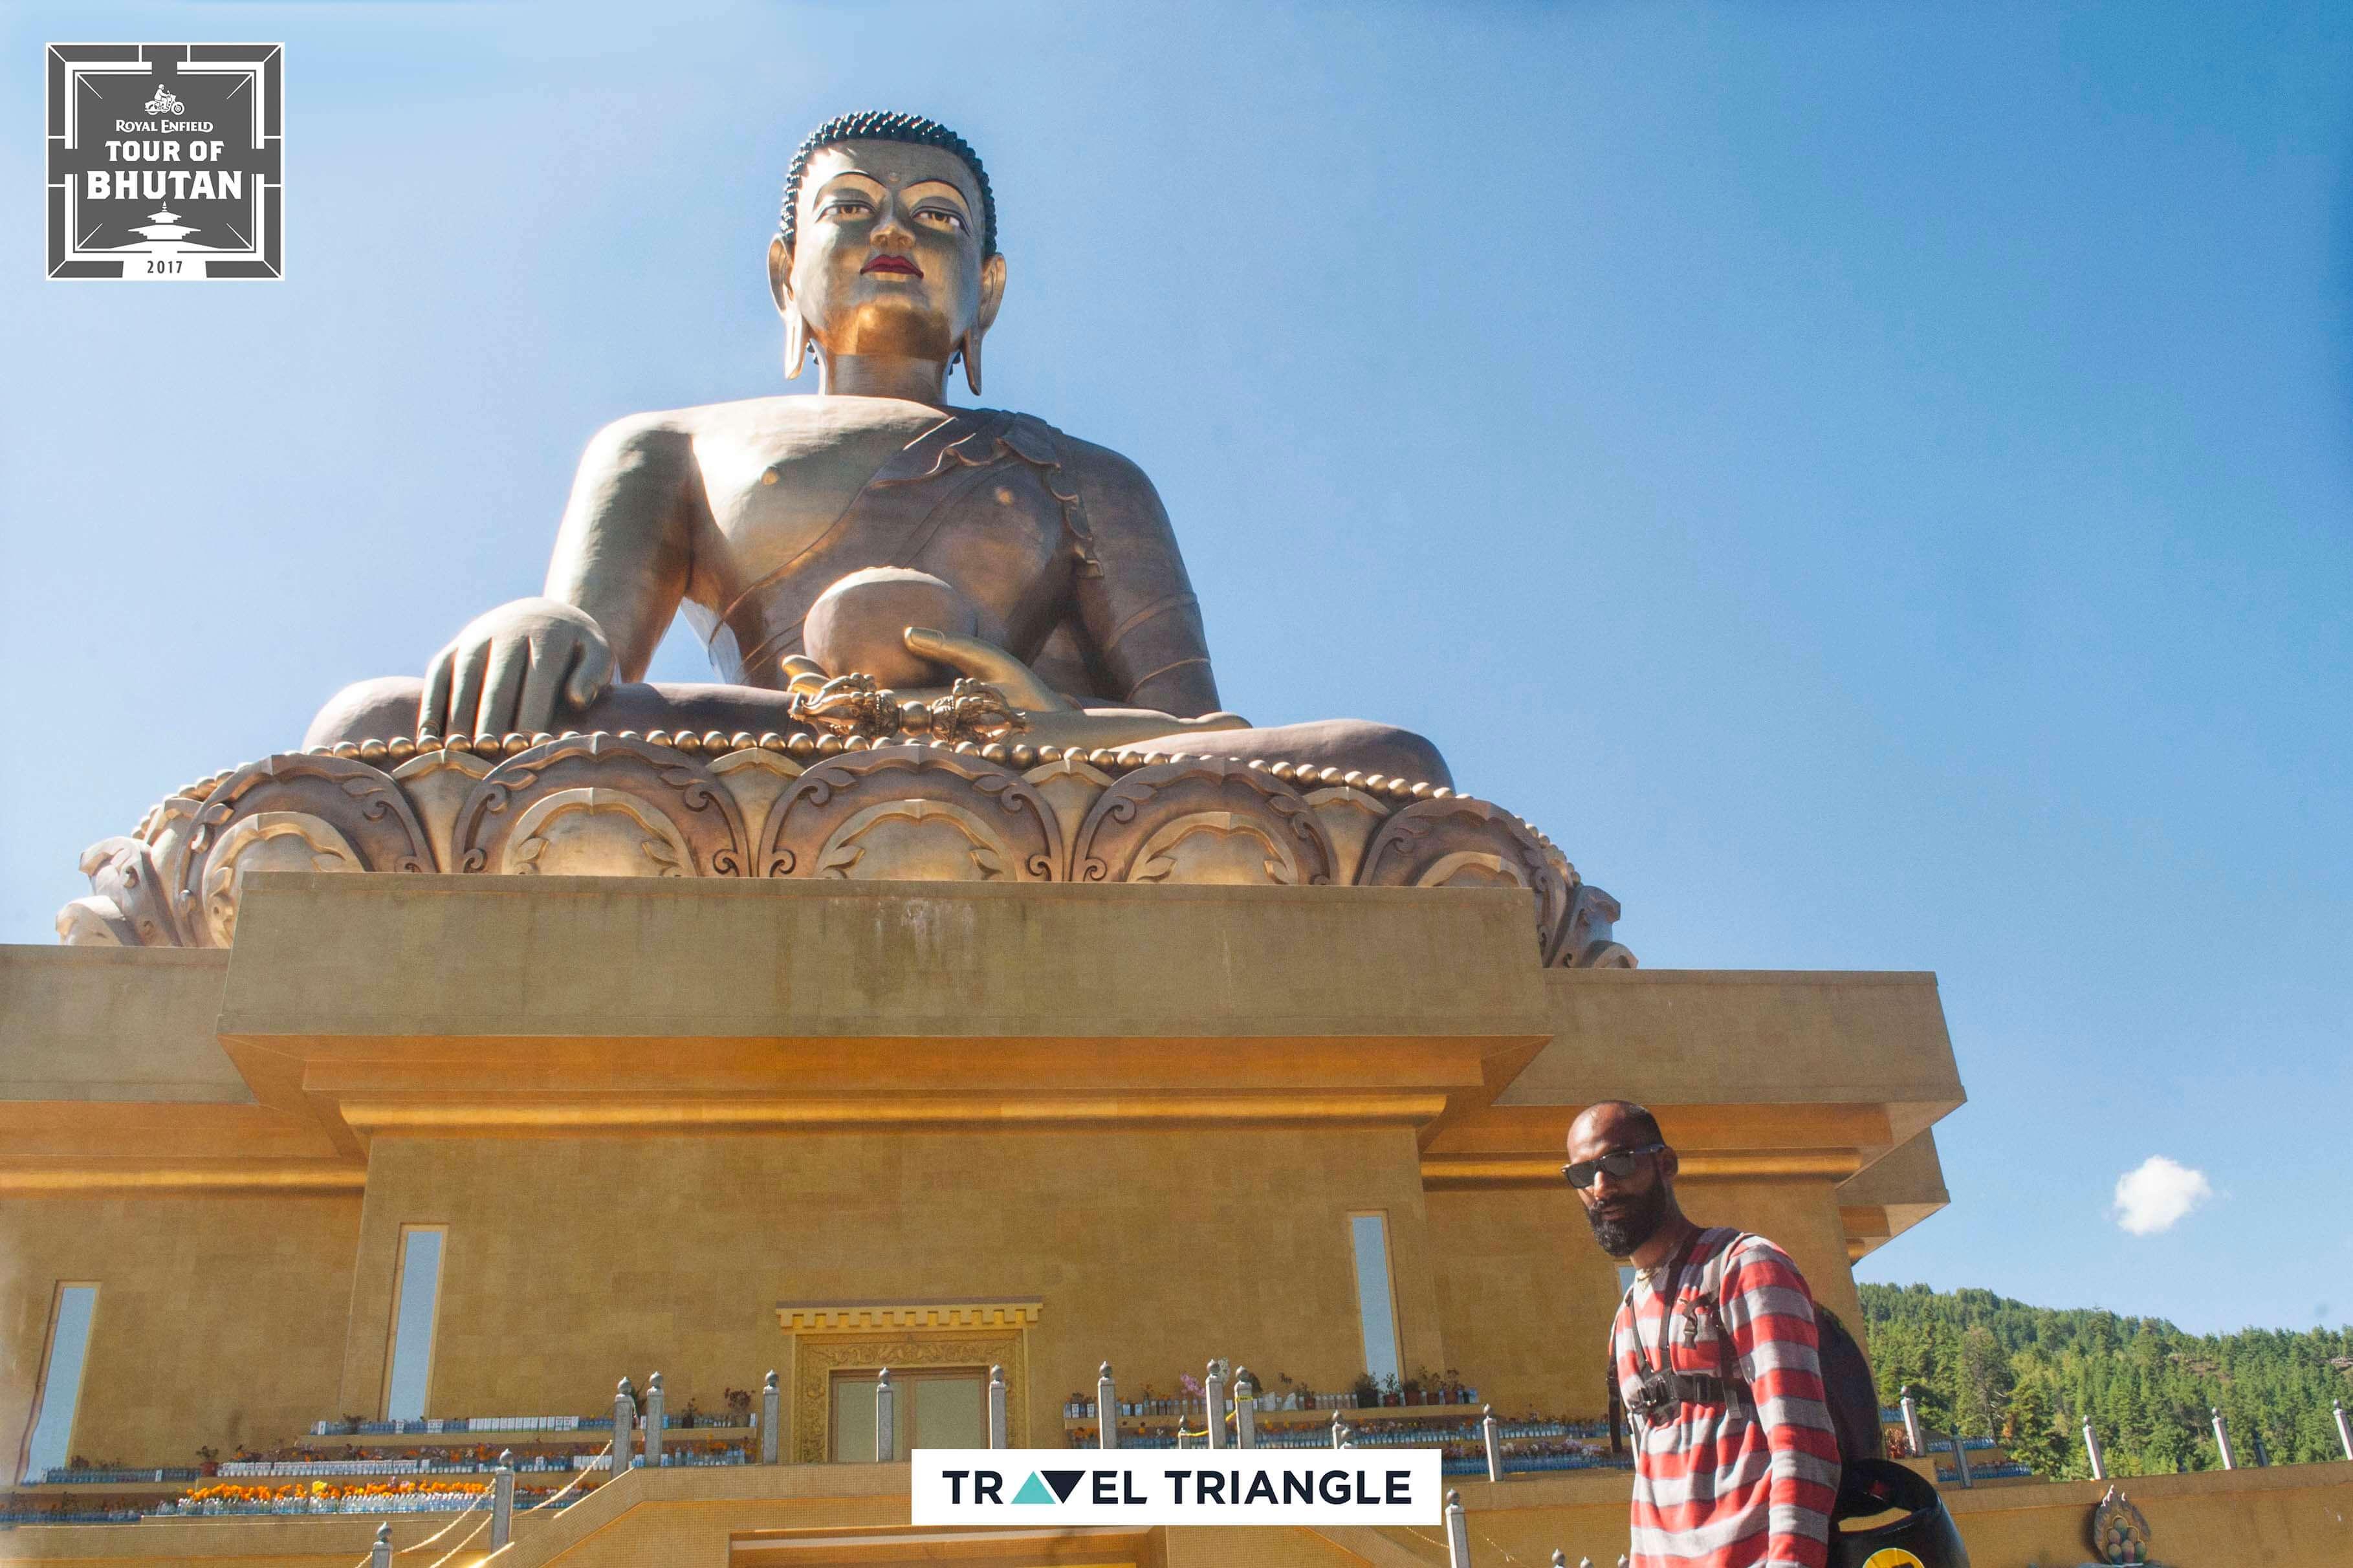 Thimphu: Exploring Buddhist temples on the royal enfield bike trip